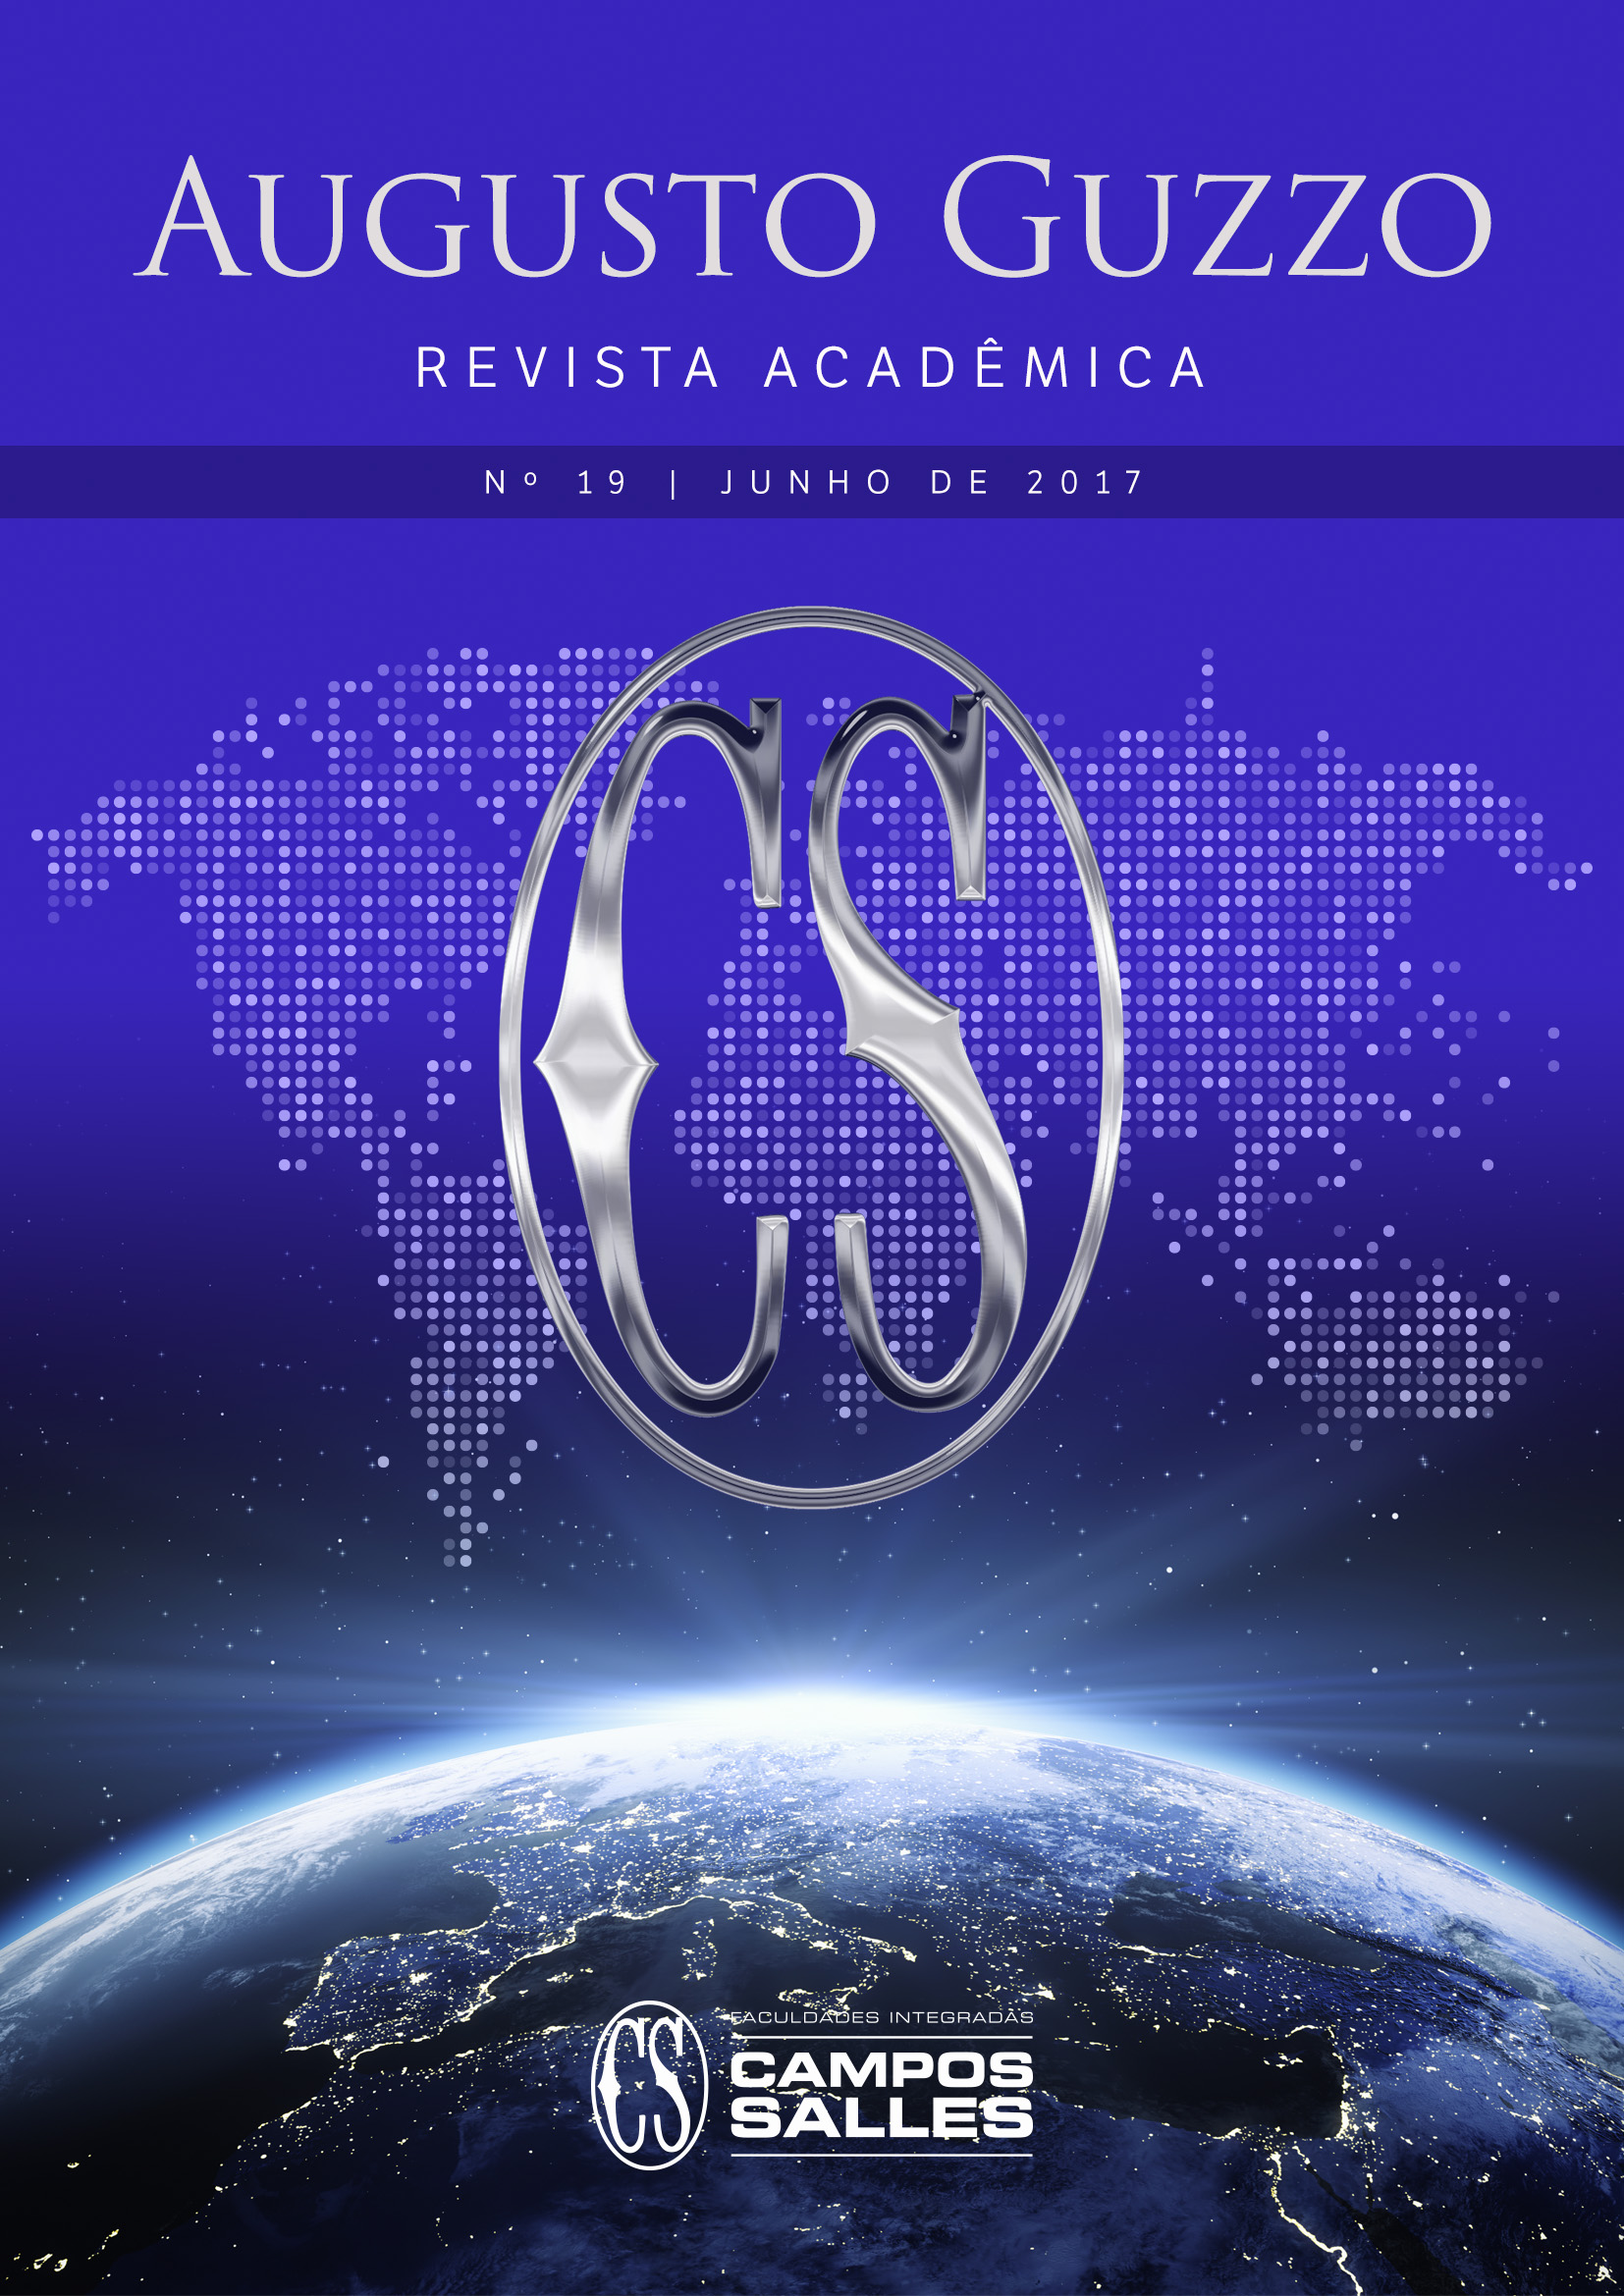 Revista Acadêmica Augusto Guzzo